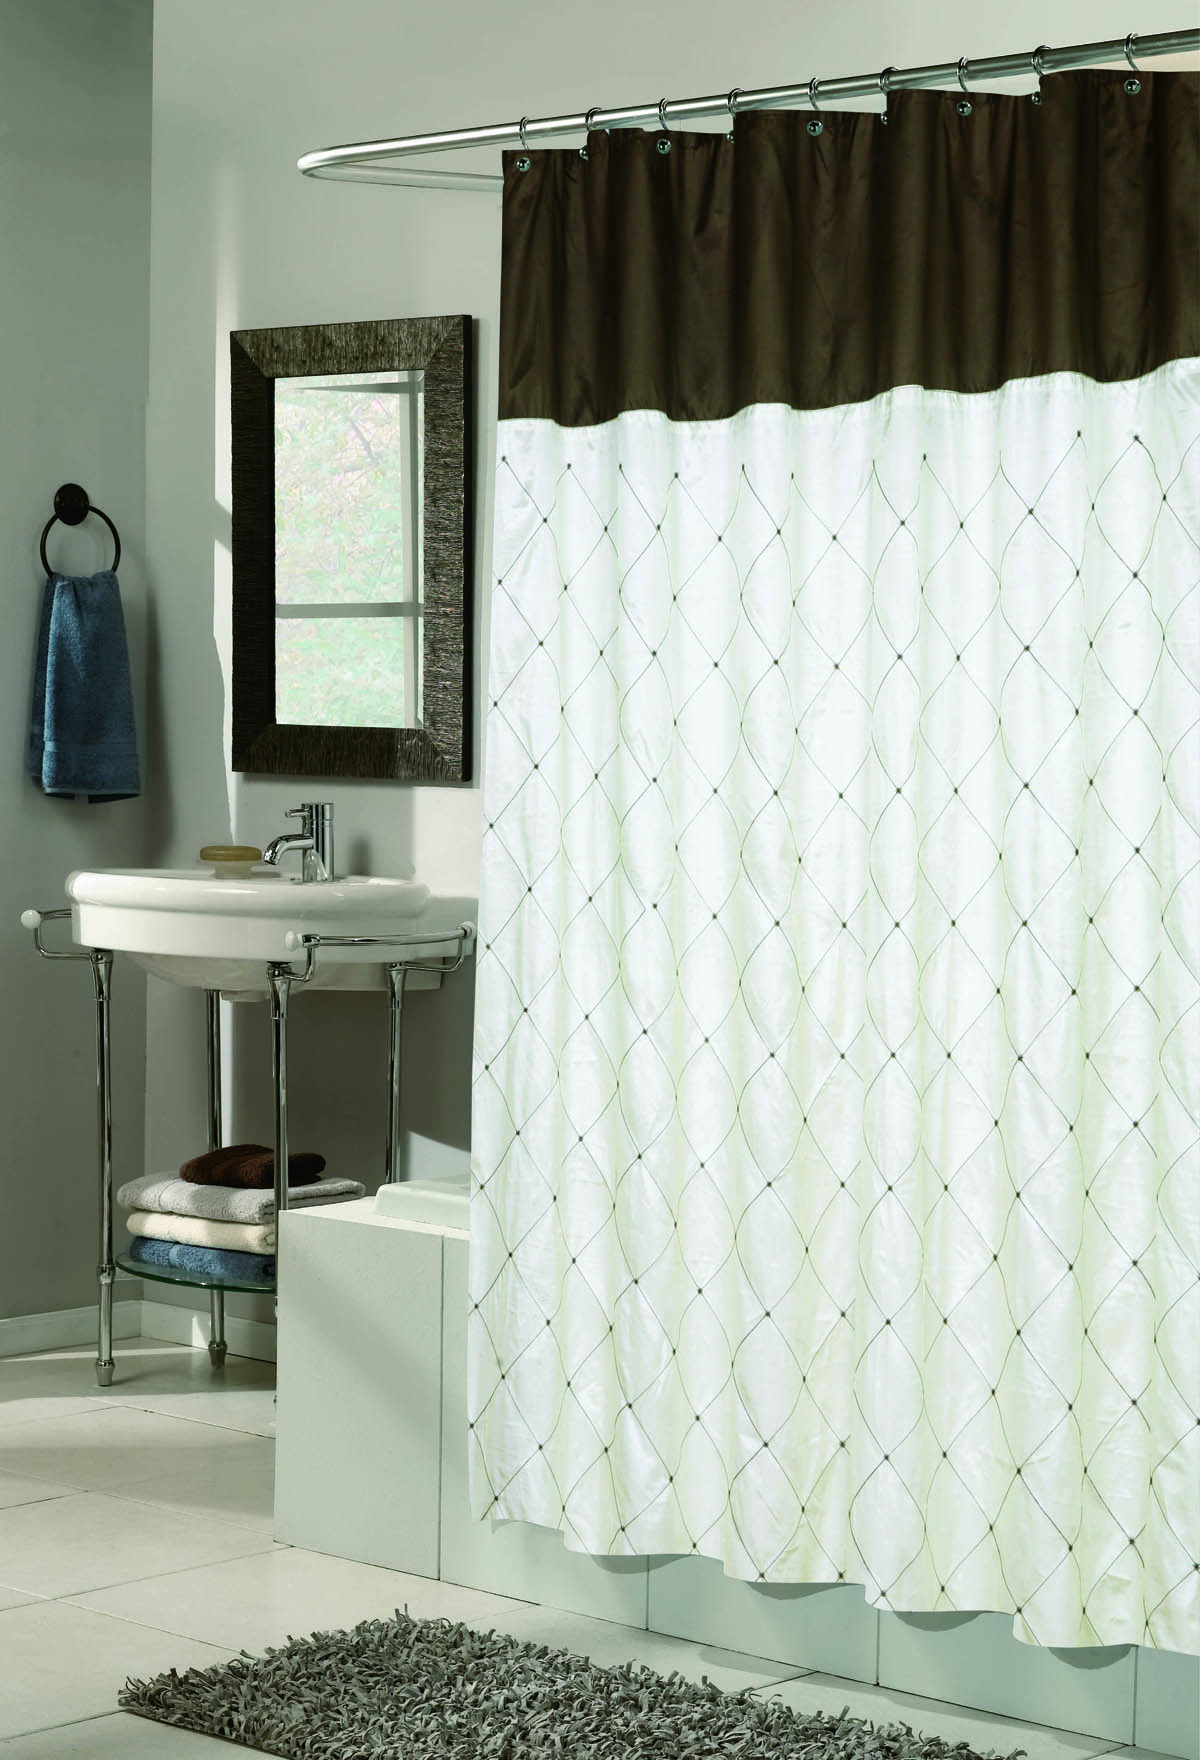 Элитная шторка для ванной Balmoral Ivory от Carnation Home Fashions